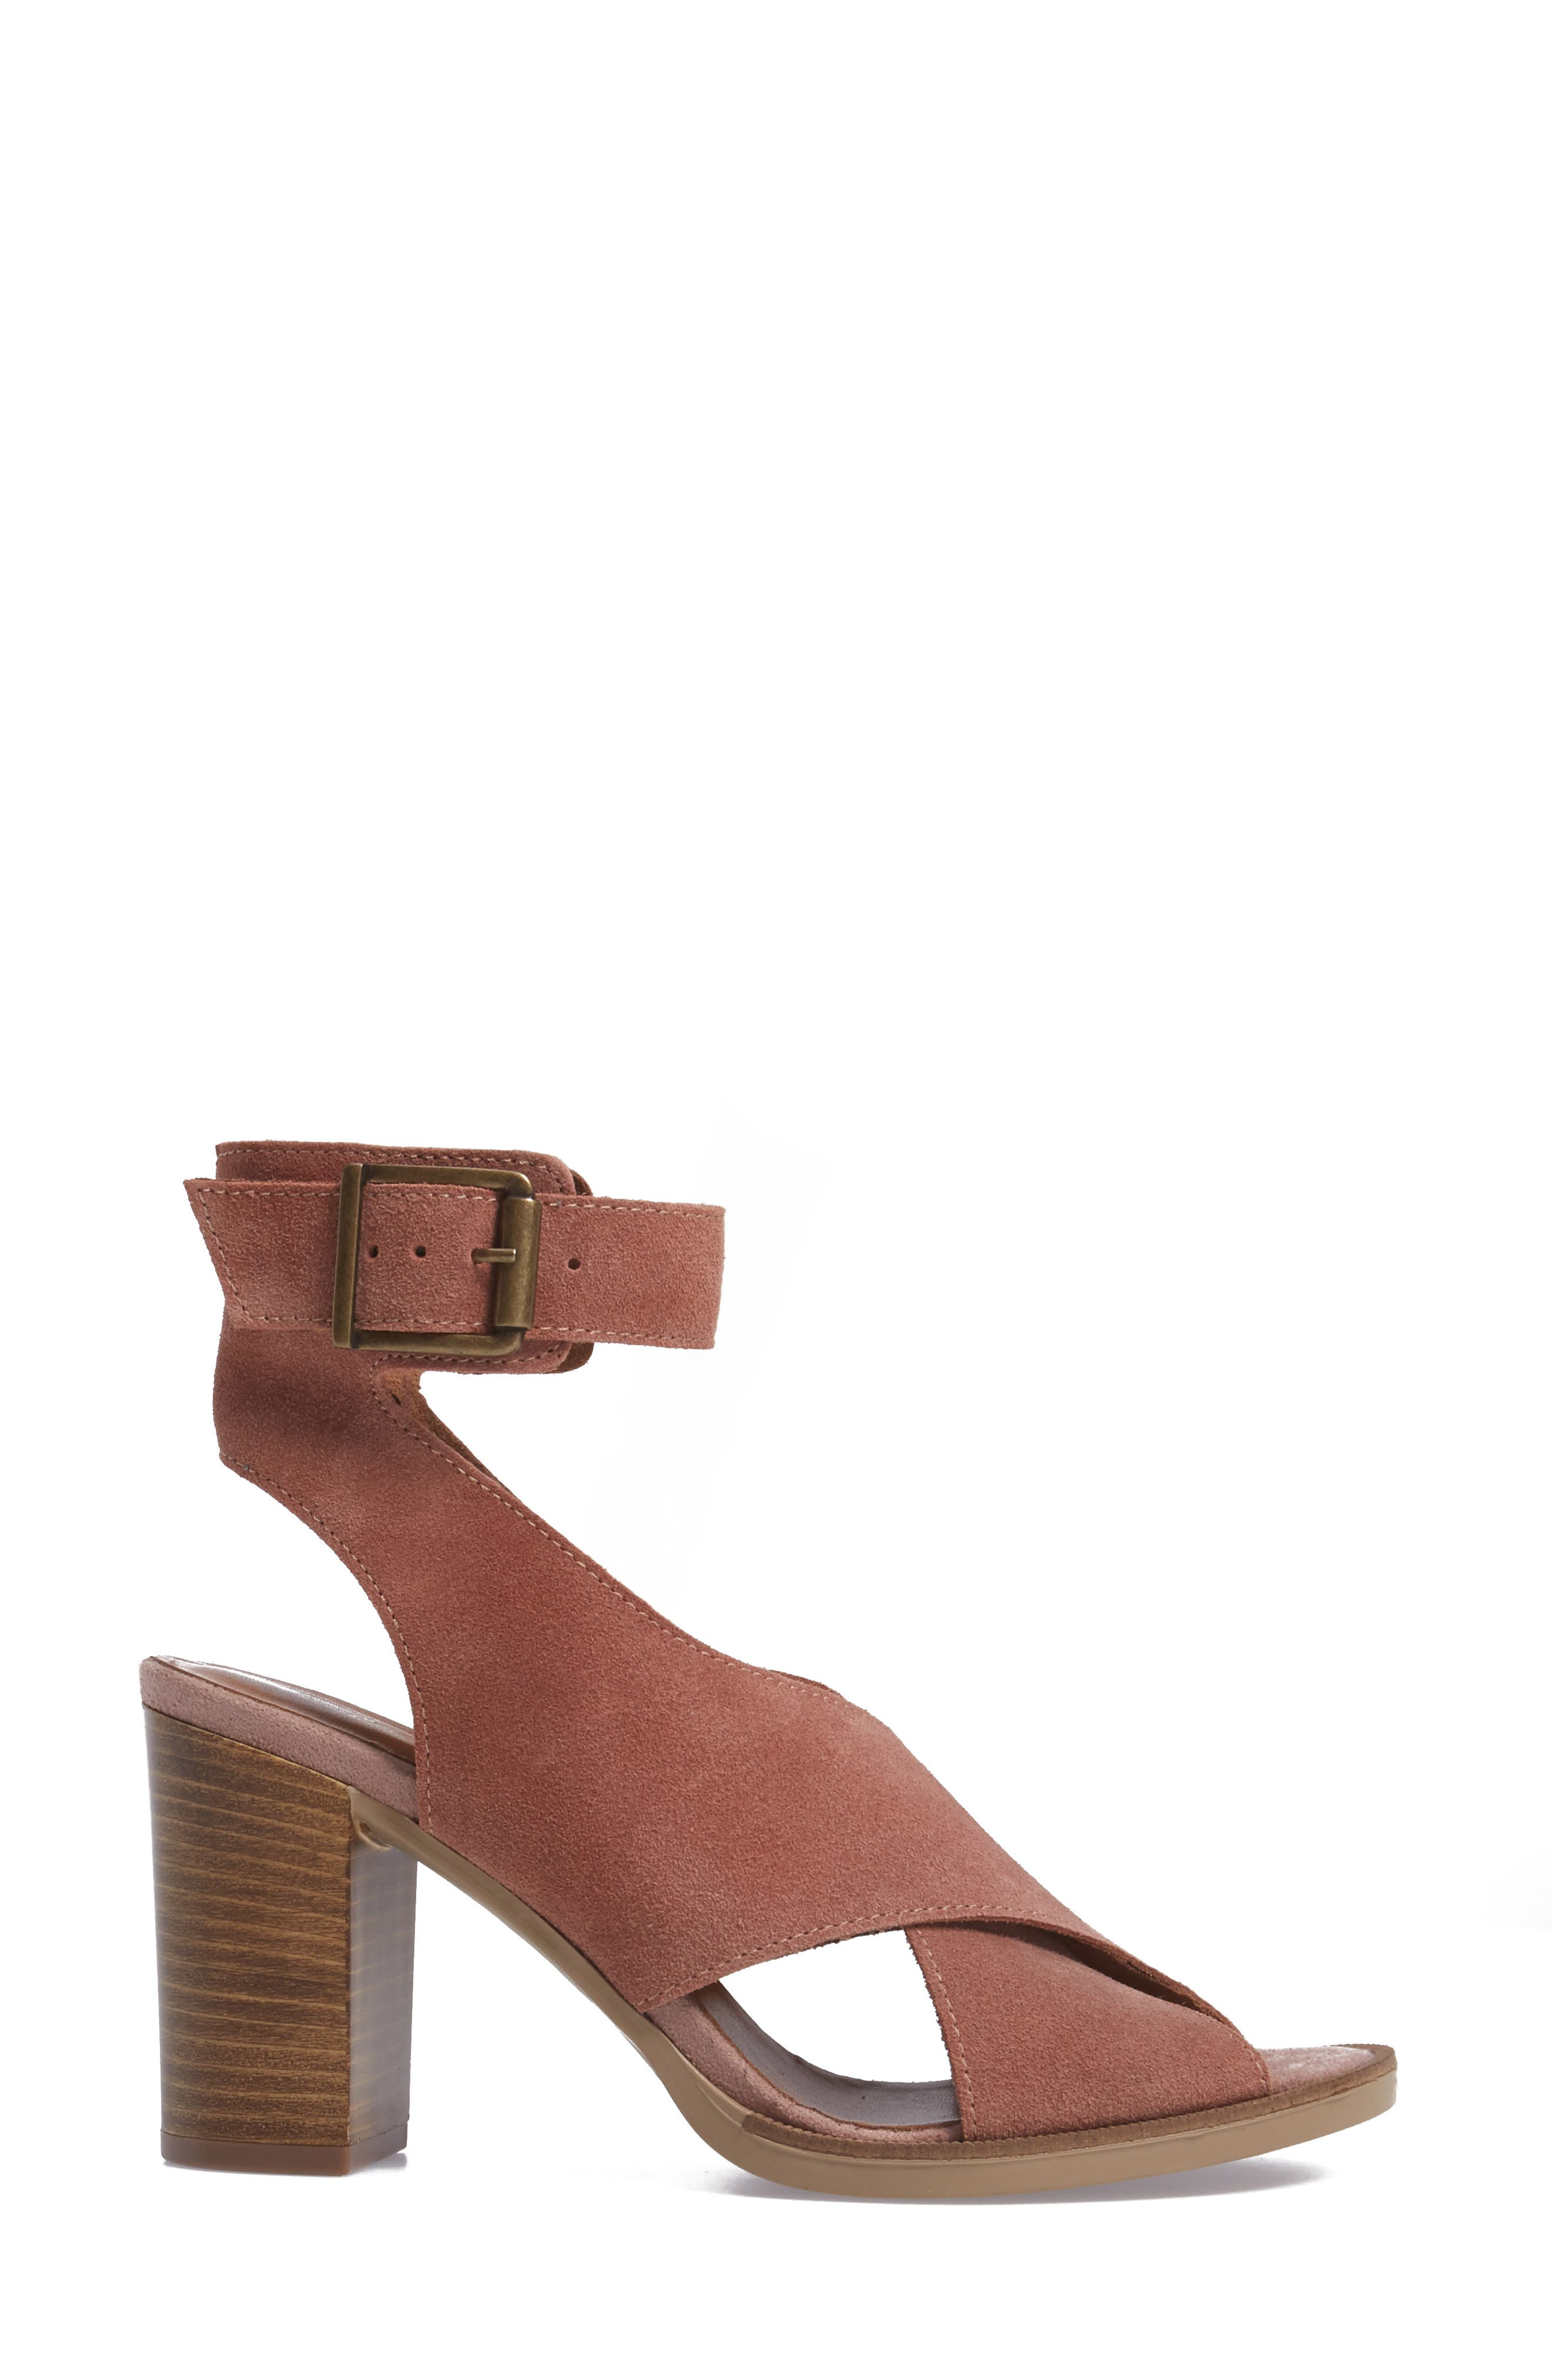 Alternate Image 3  - Bella Vita Lil Ankle Wrap Sandal (Women)